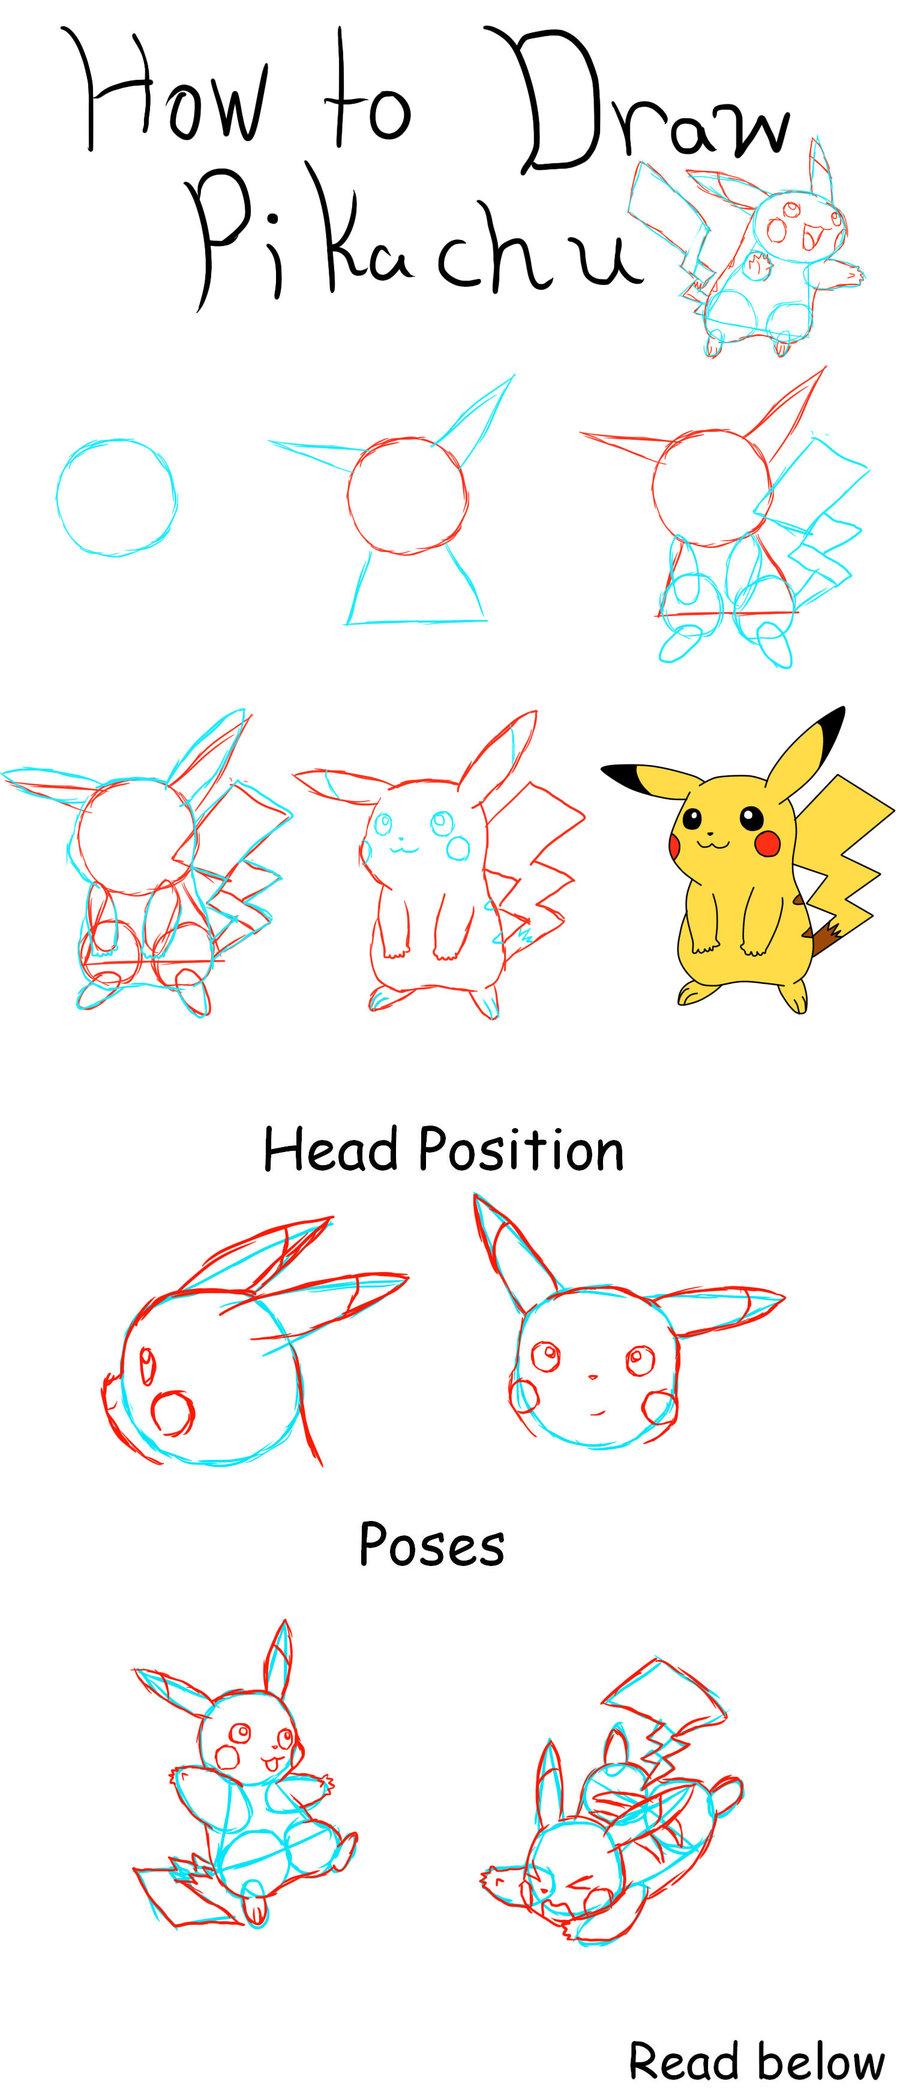 Drawn pikachu hello To Pikachu PikaAly DeviantArt on